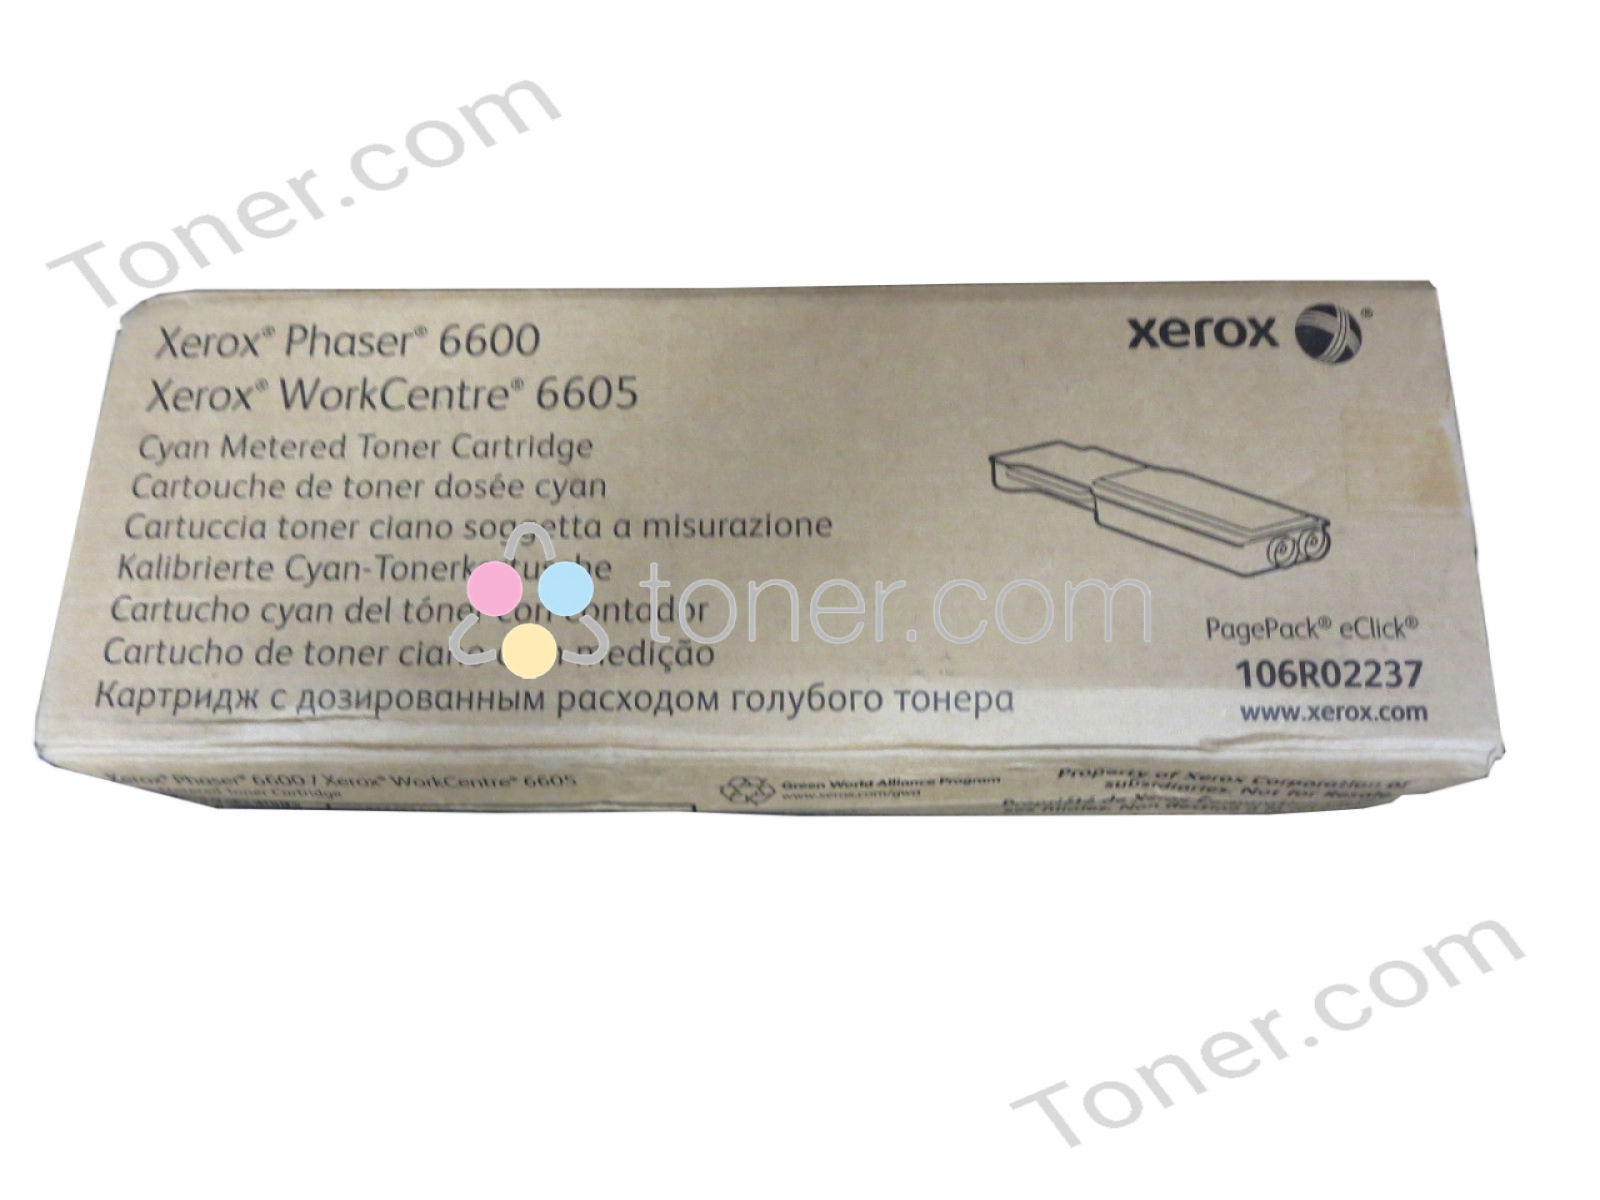 Xerox 106R02237,CT202015,1P106R2237,1P106R02237,106R2237 XEROX